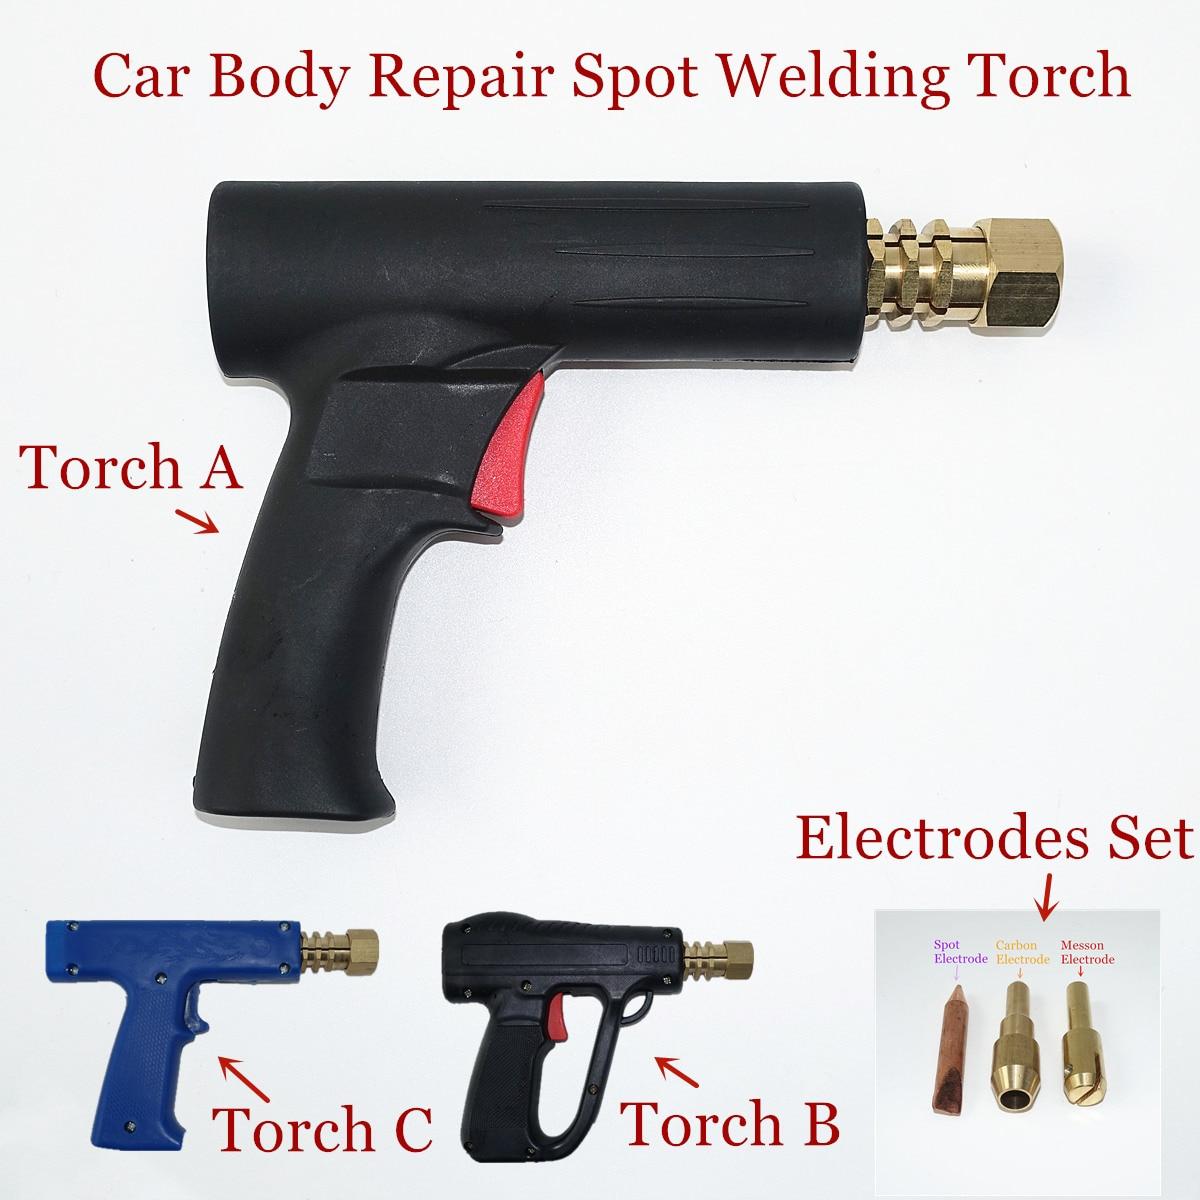 Car Body Repair Gun Dent Pulling Torch Washer Wavy Wire Carbon Garage Sheet Metal Repair Spot Welding Torch